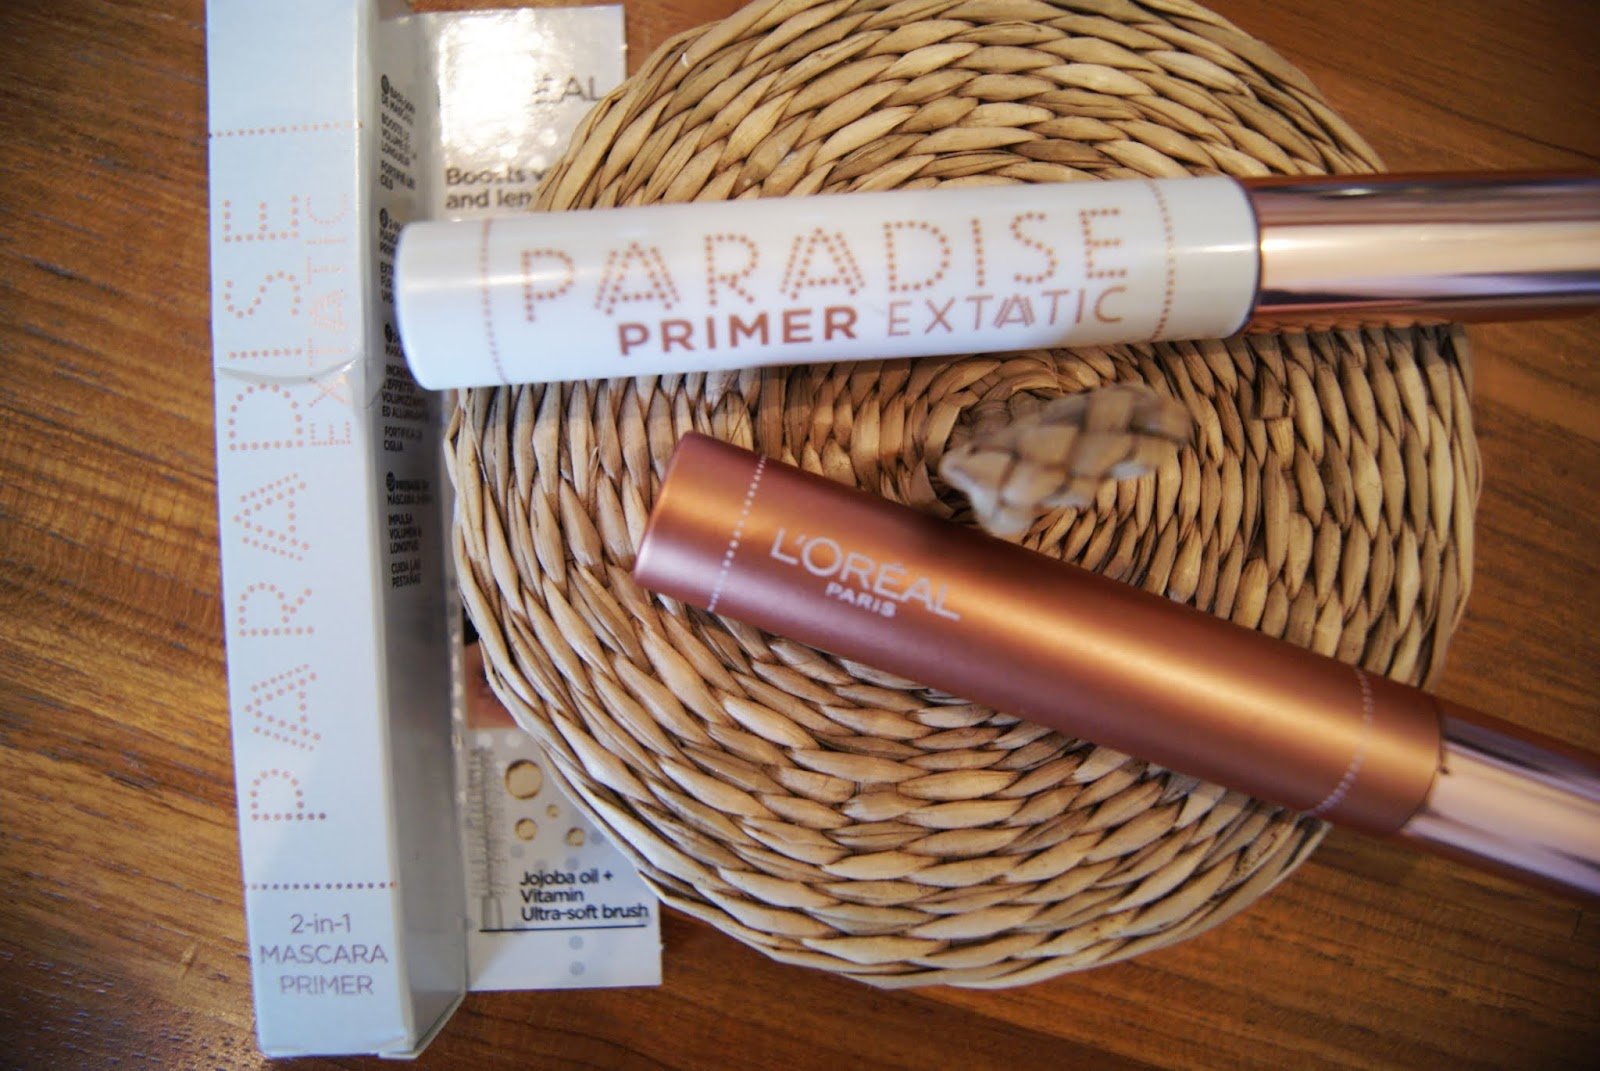 Base-Soin Paradise Extatic L'Oréal